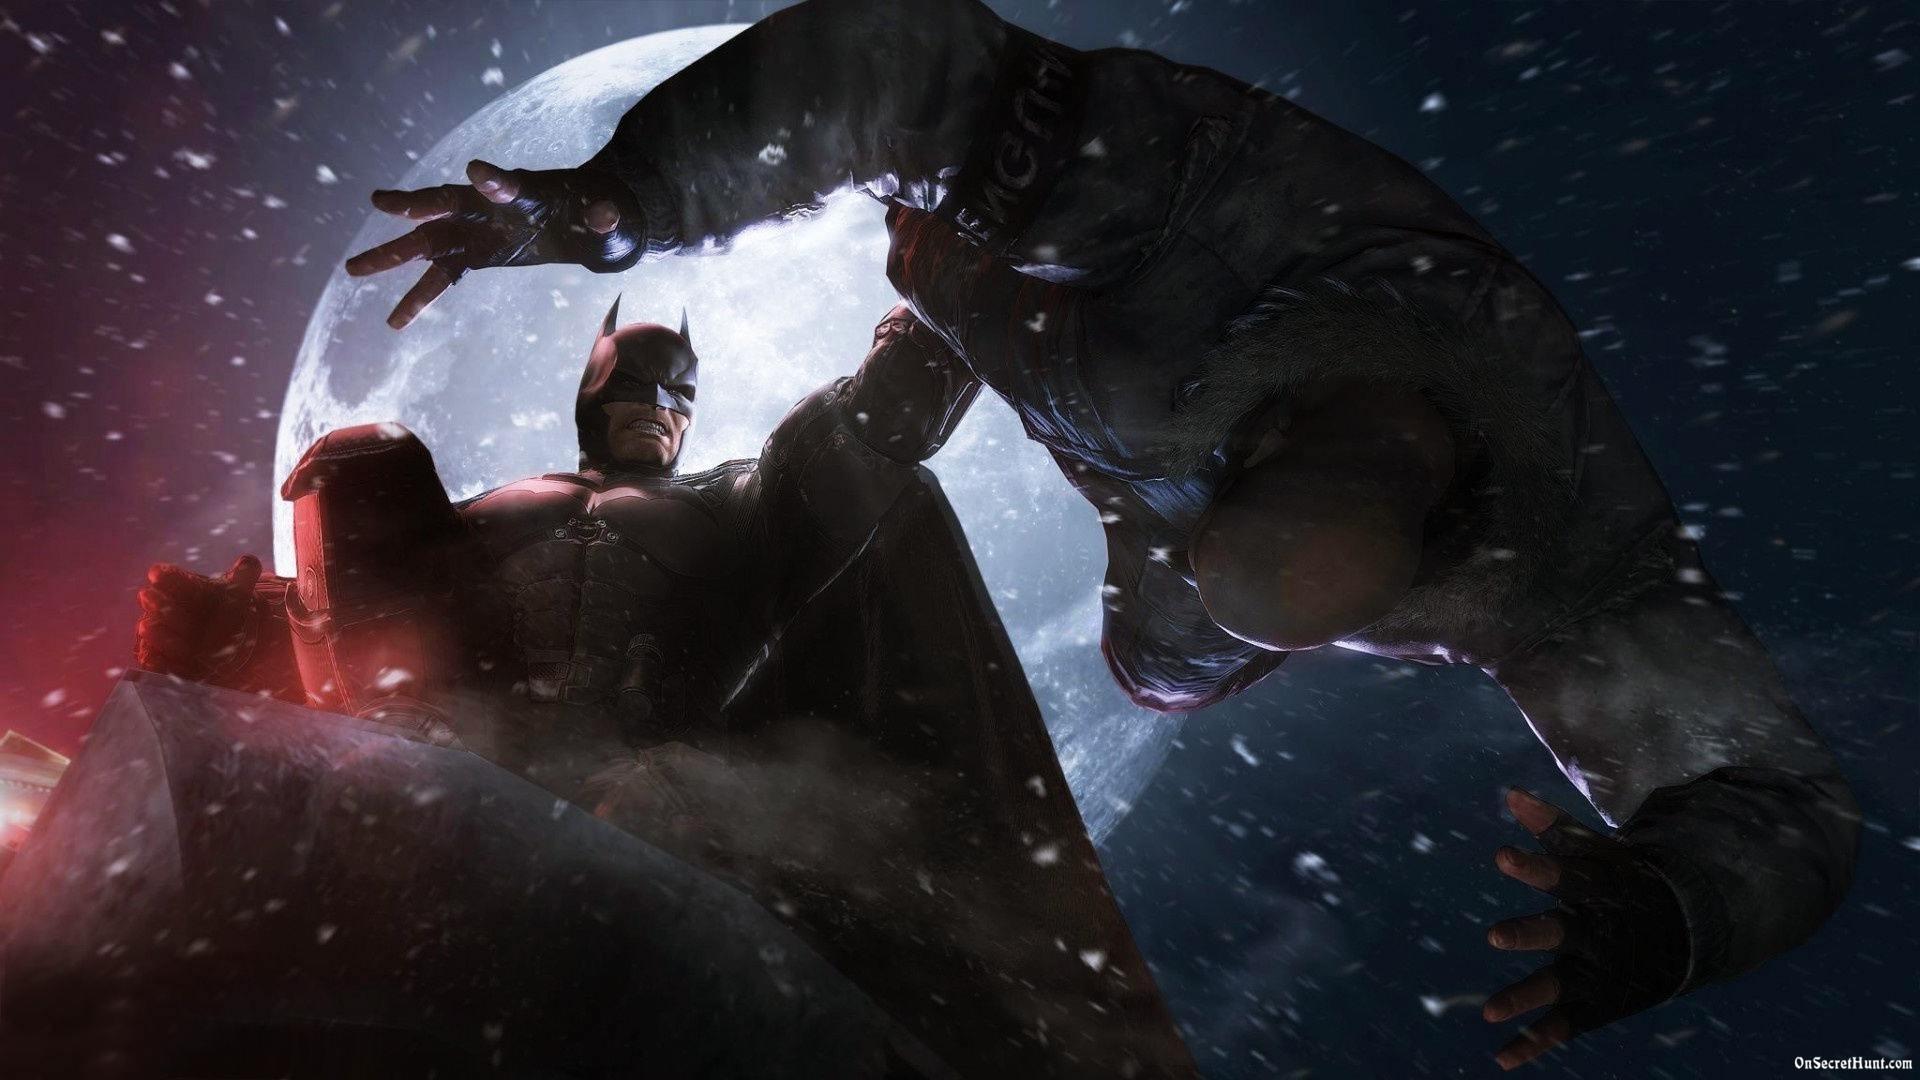 Batman 2013 Arkham Origins Game HD Wallpaper   Game HD Wallpaper